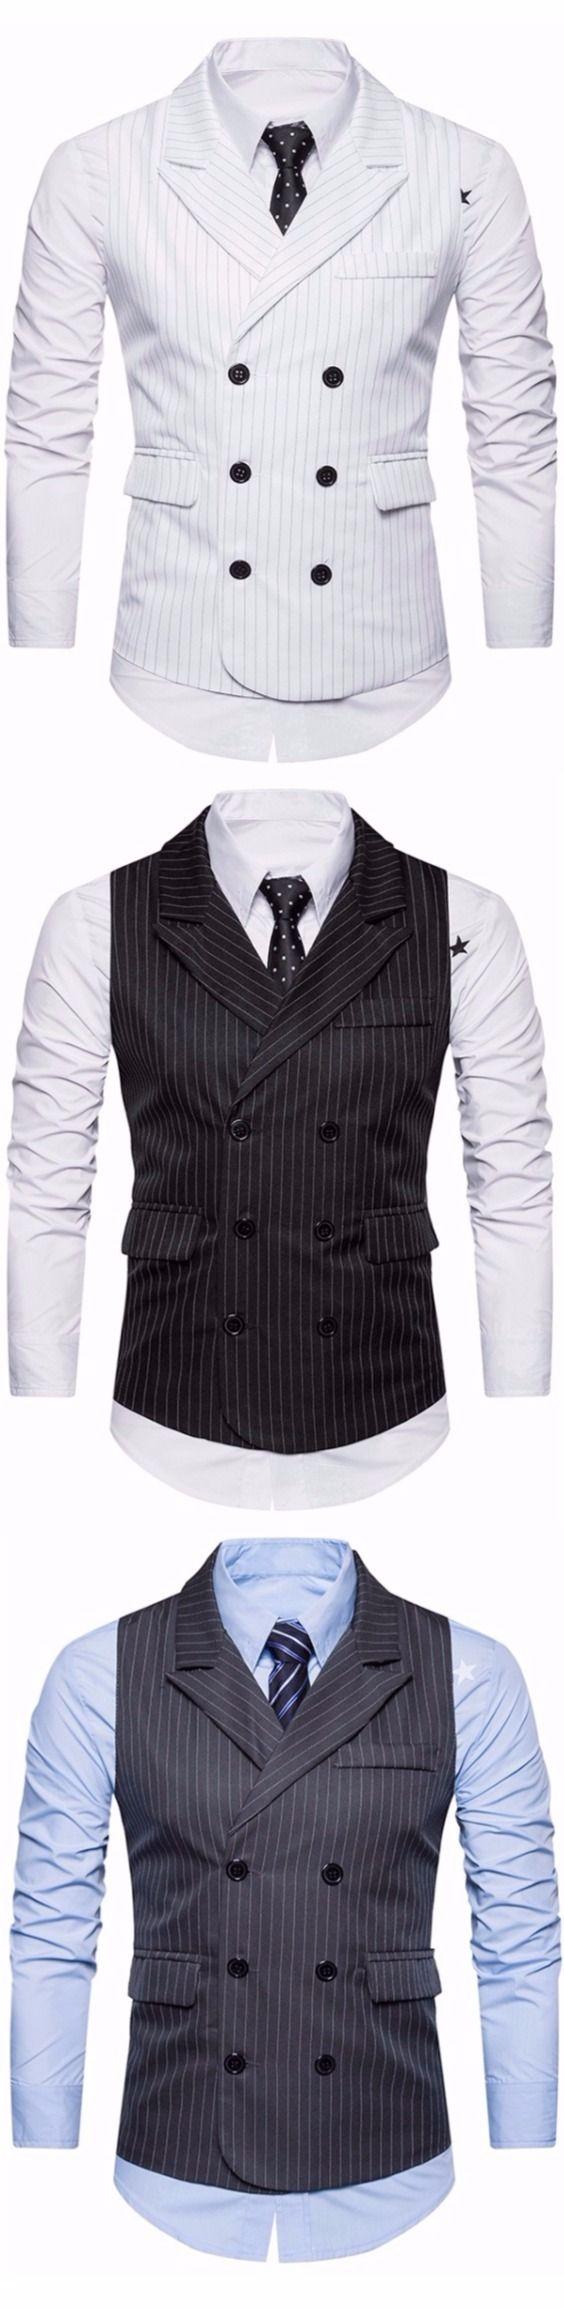 Turndown Collar Double Breasted Belt Vertical Stripe Waistcoat